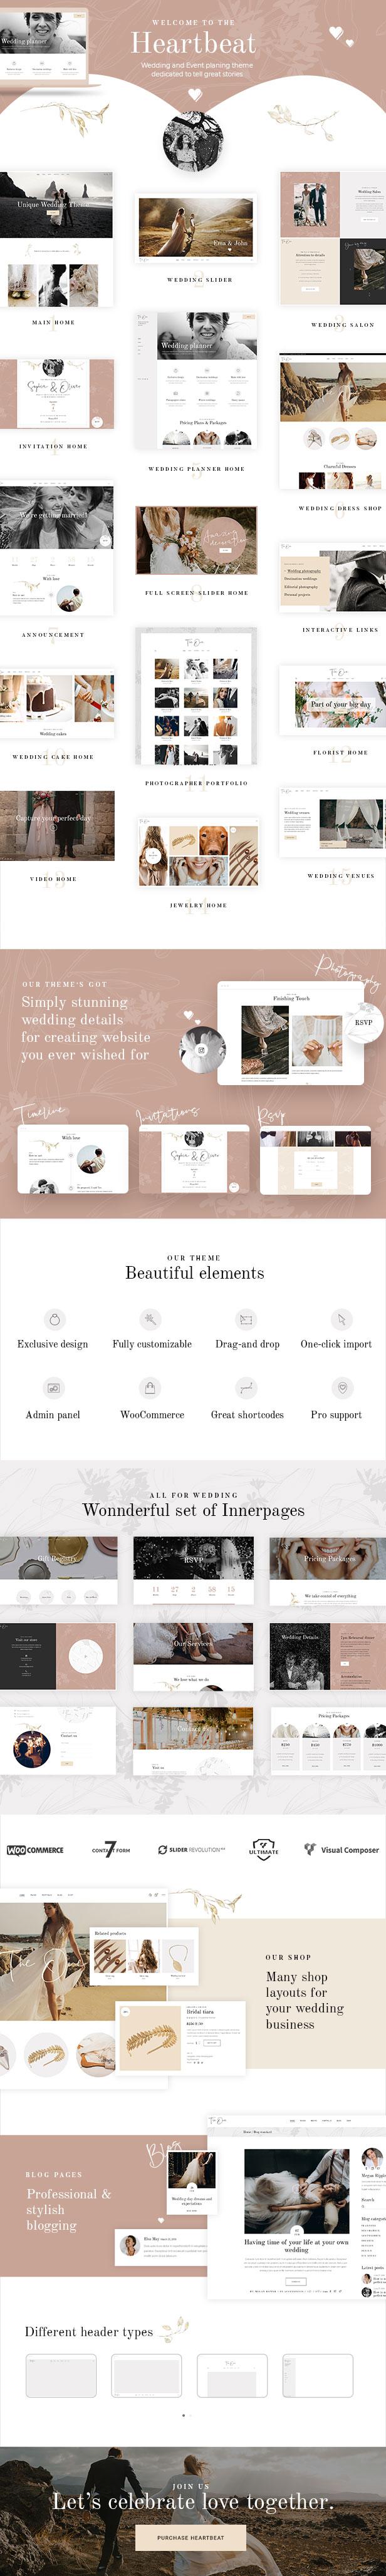 Heartbeat - Wedding and Event Planner WordPress Theme - 1